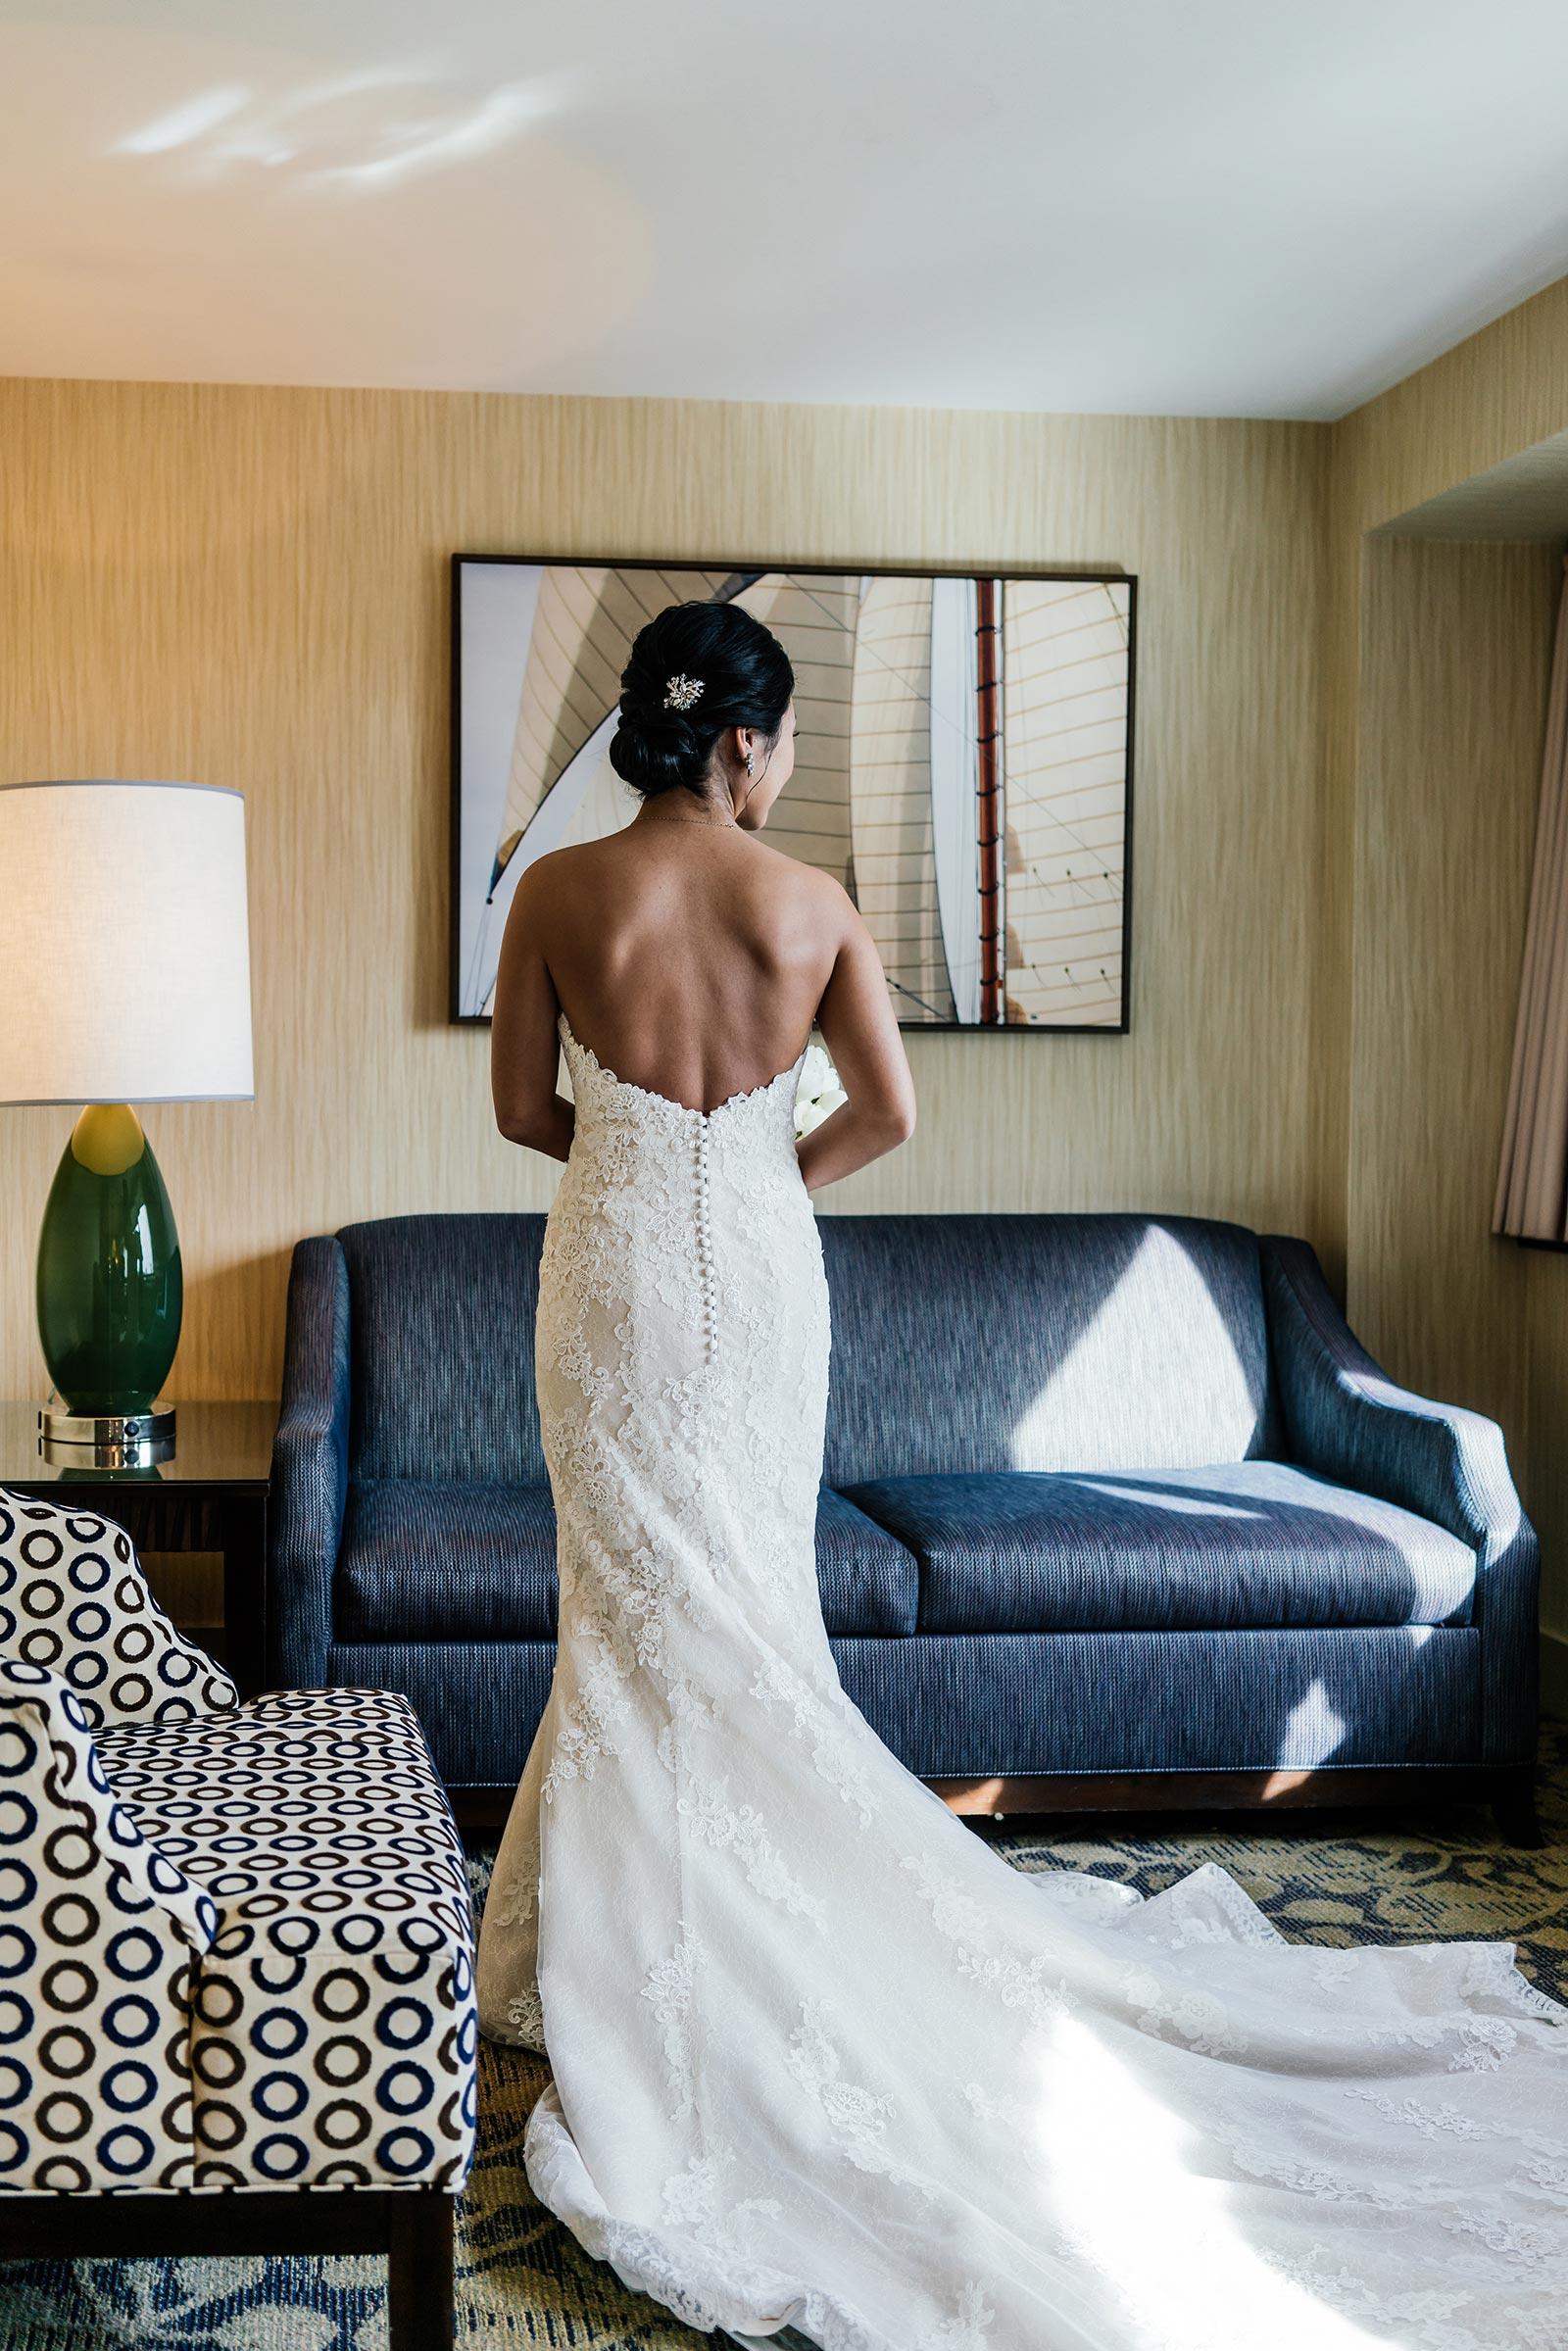 The bride, my beautiful friend  Fran